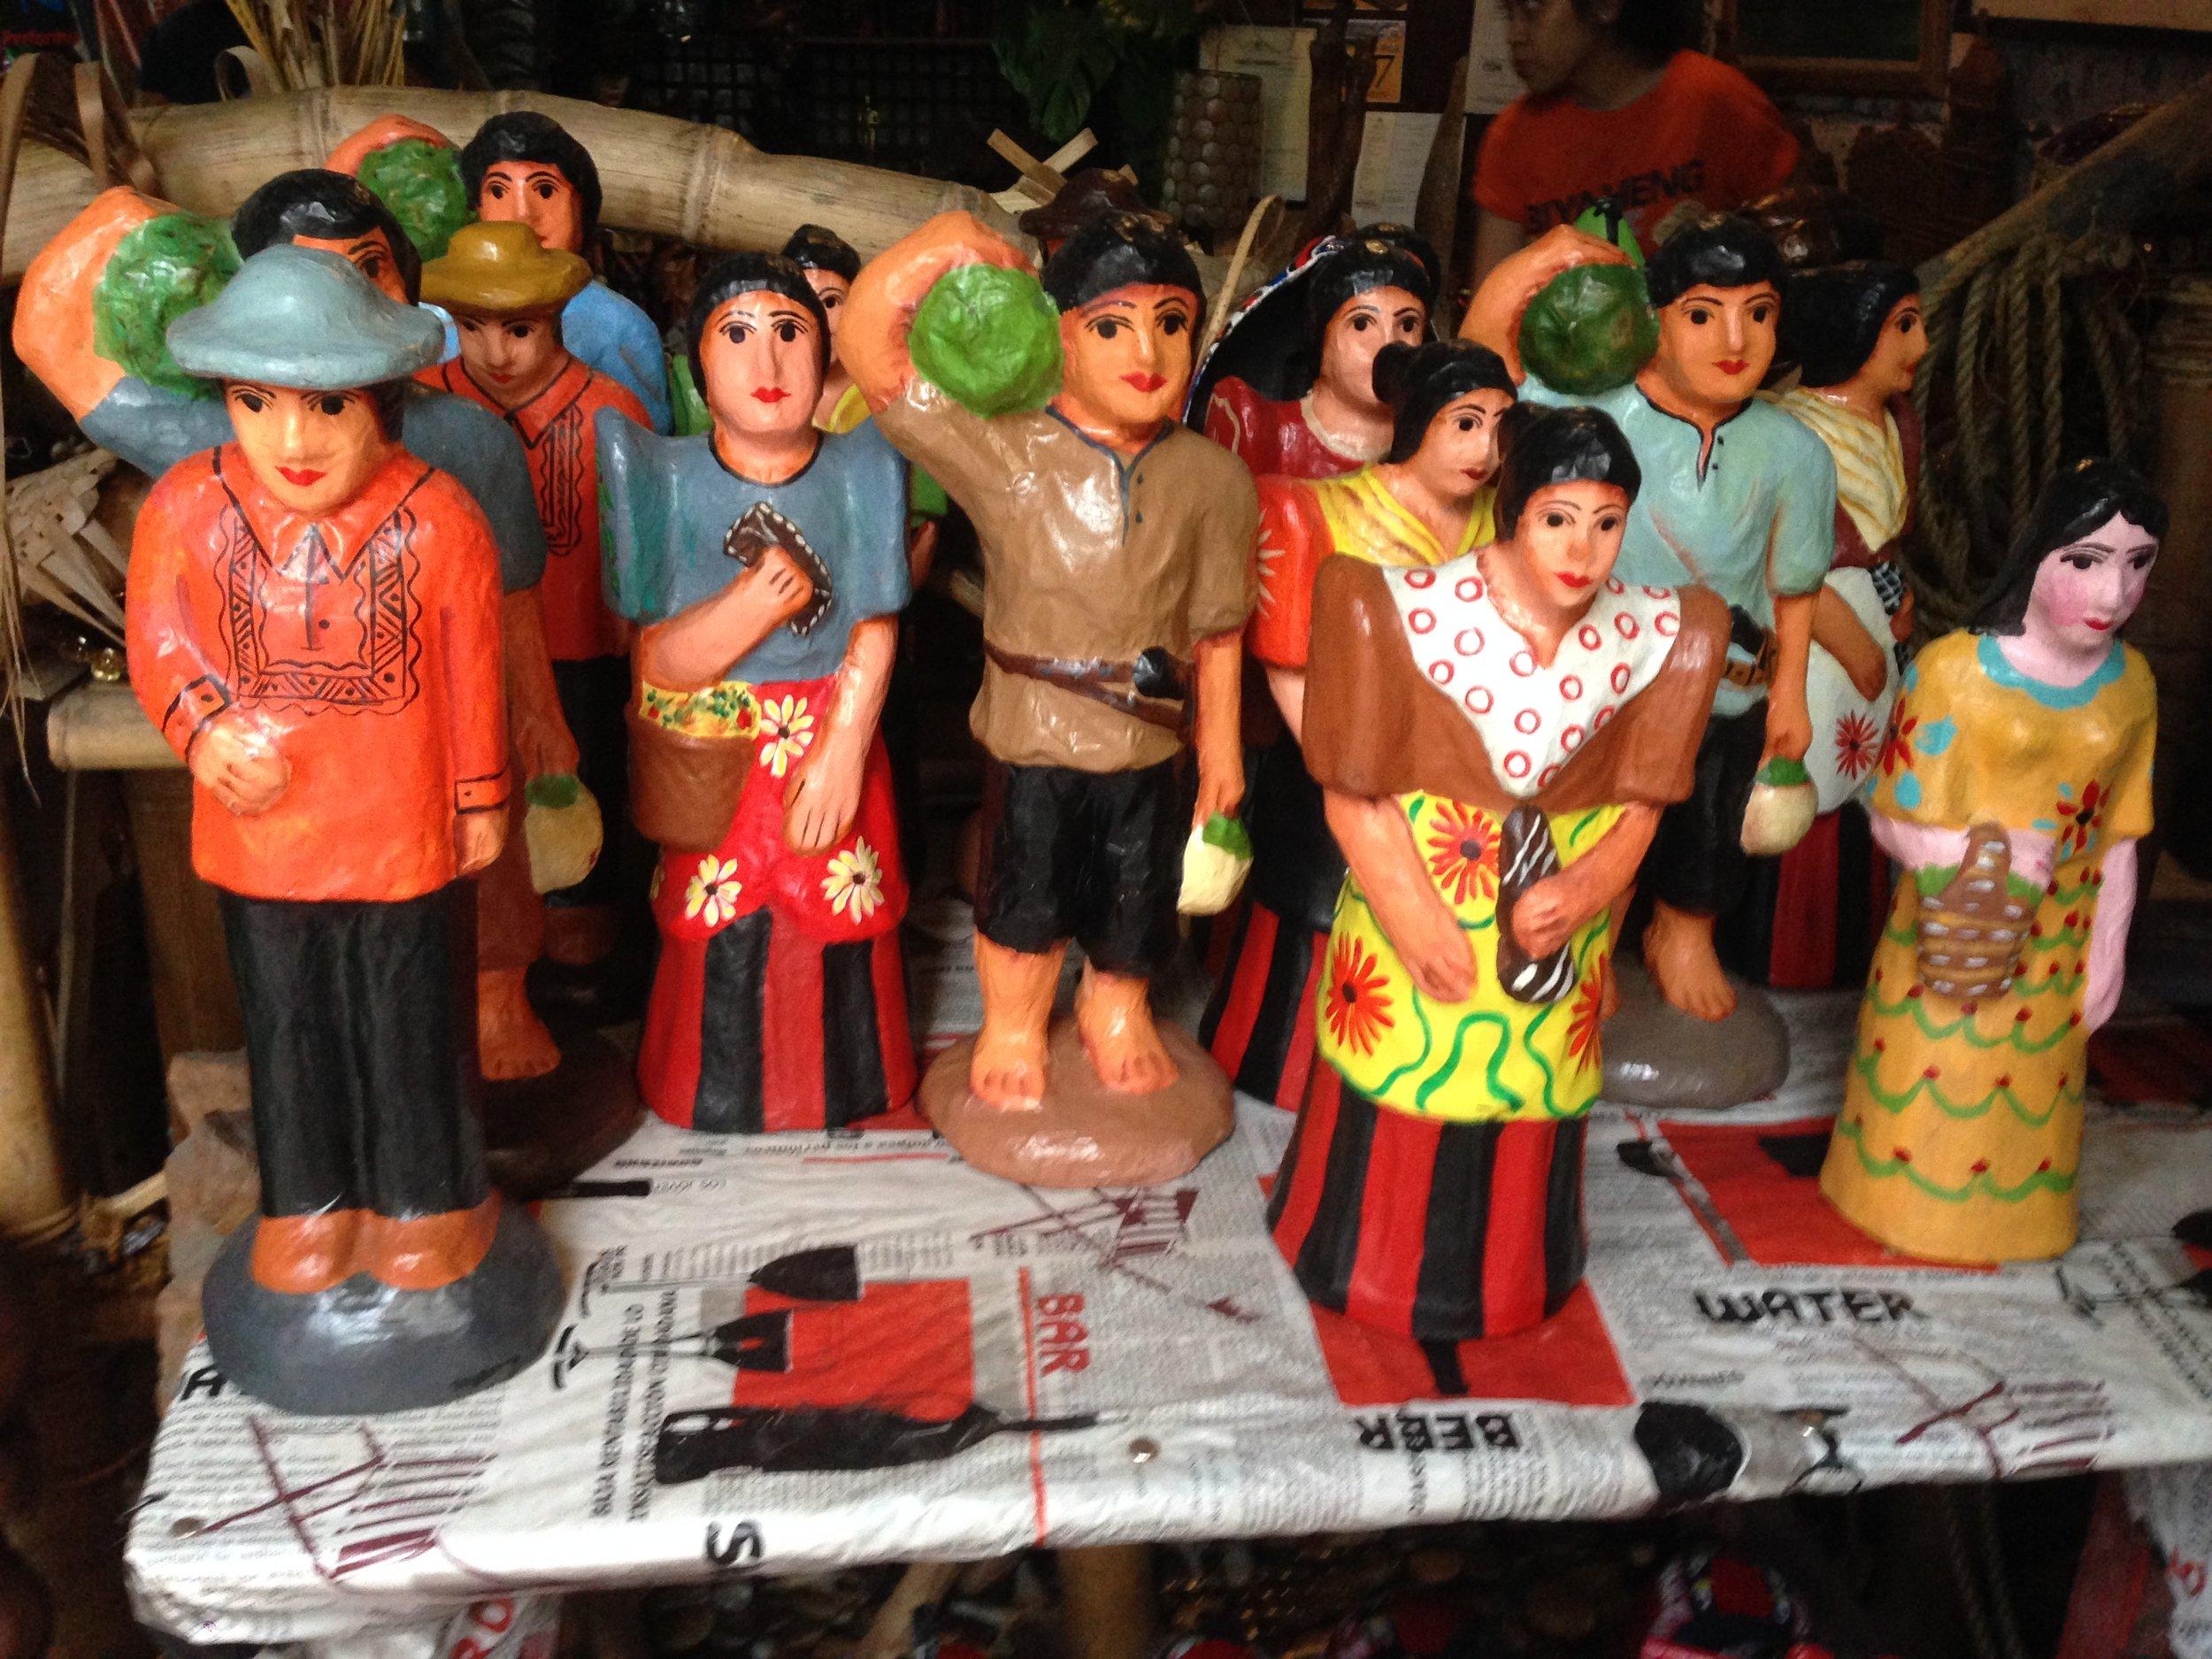 Taka dolls in native Filipino dress